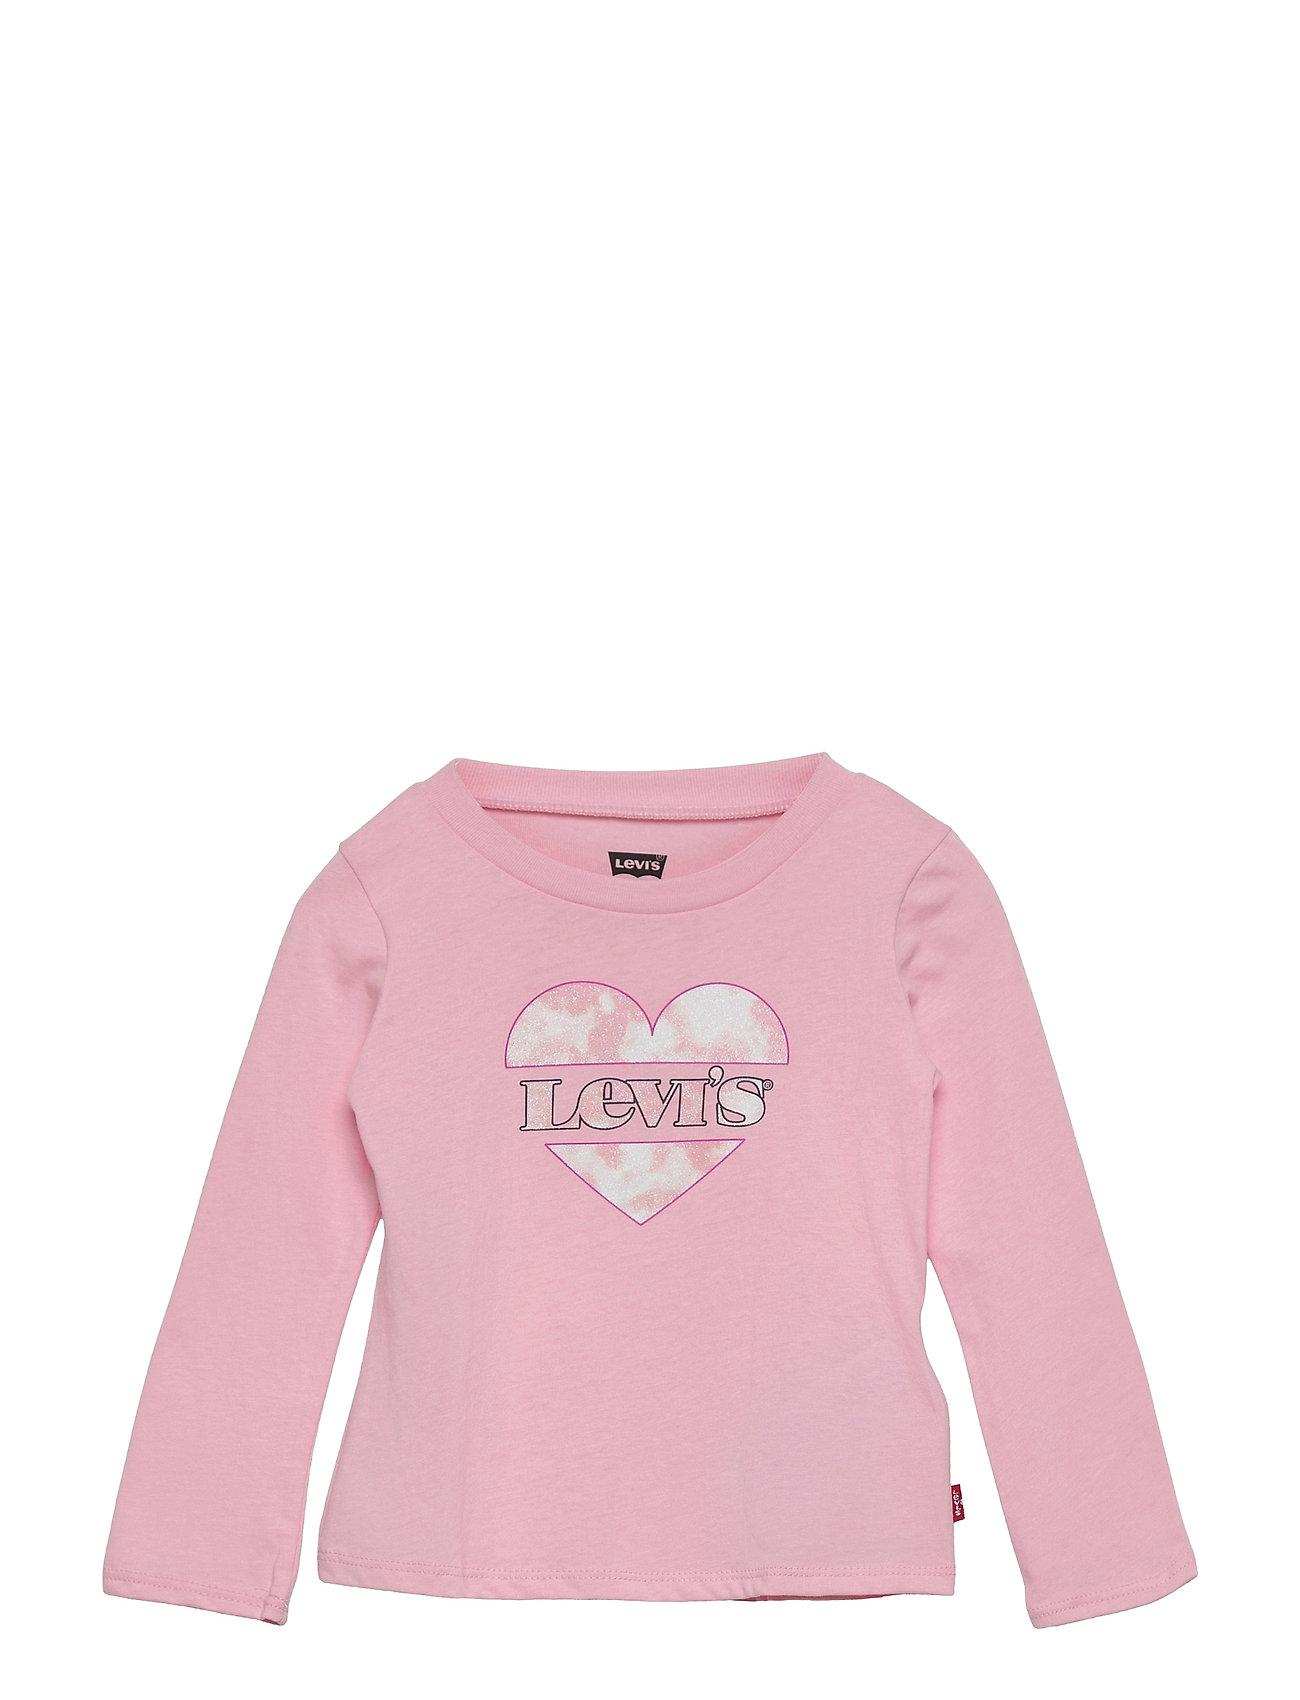 Lvg Long Sleeve Tee Shirt Langærmet T-shirt Lyserød Levi's